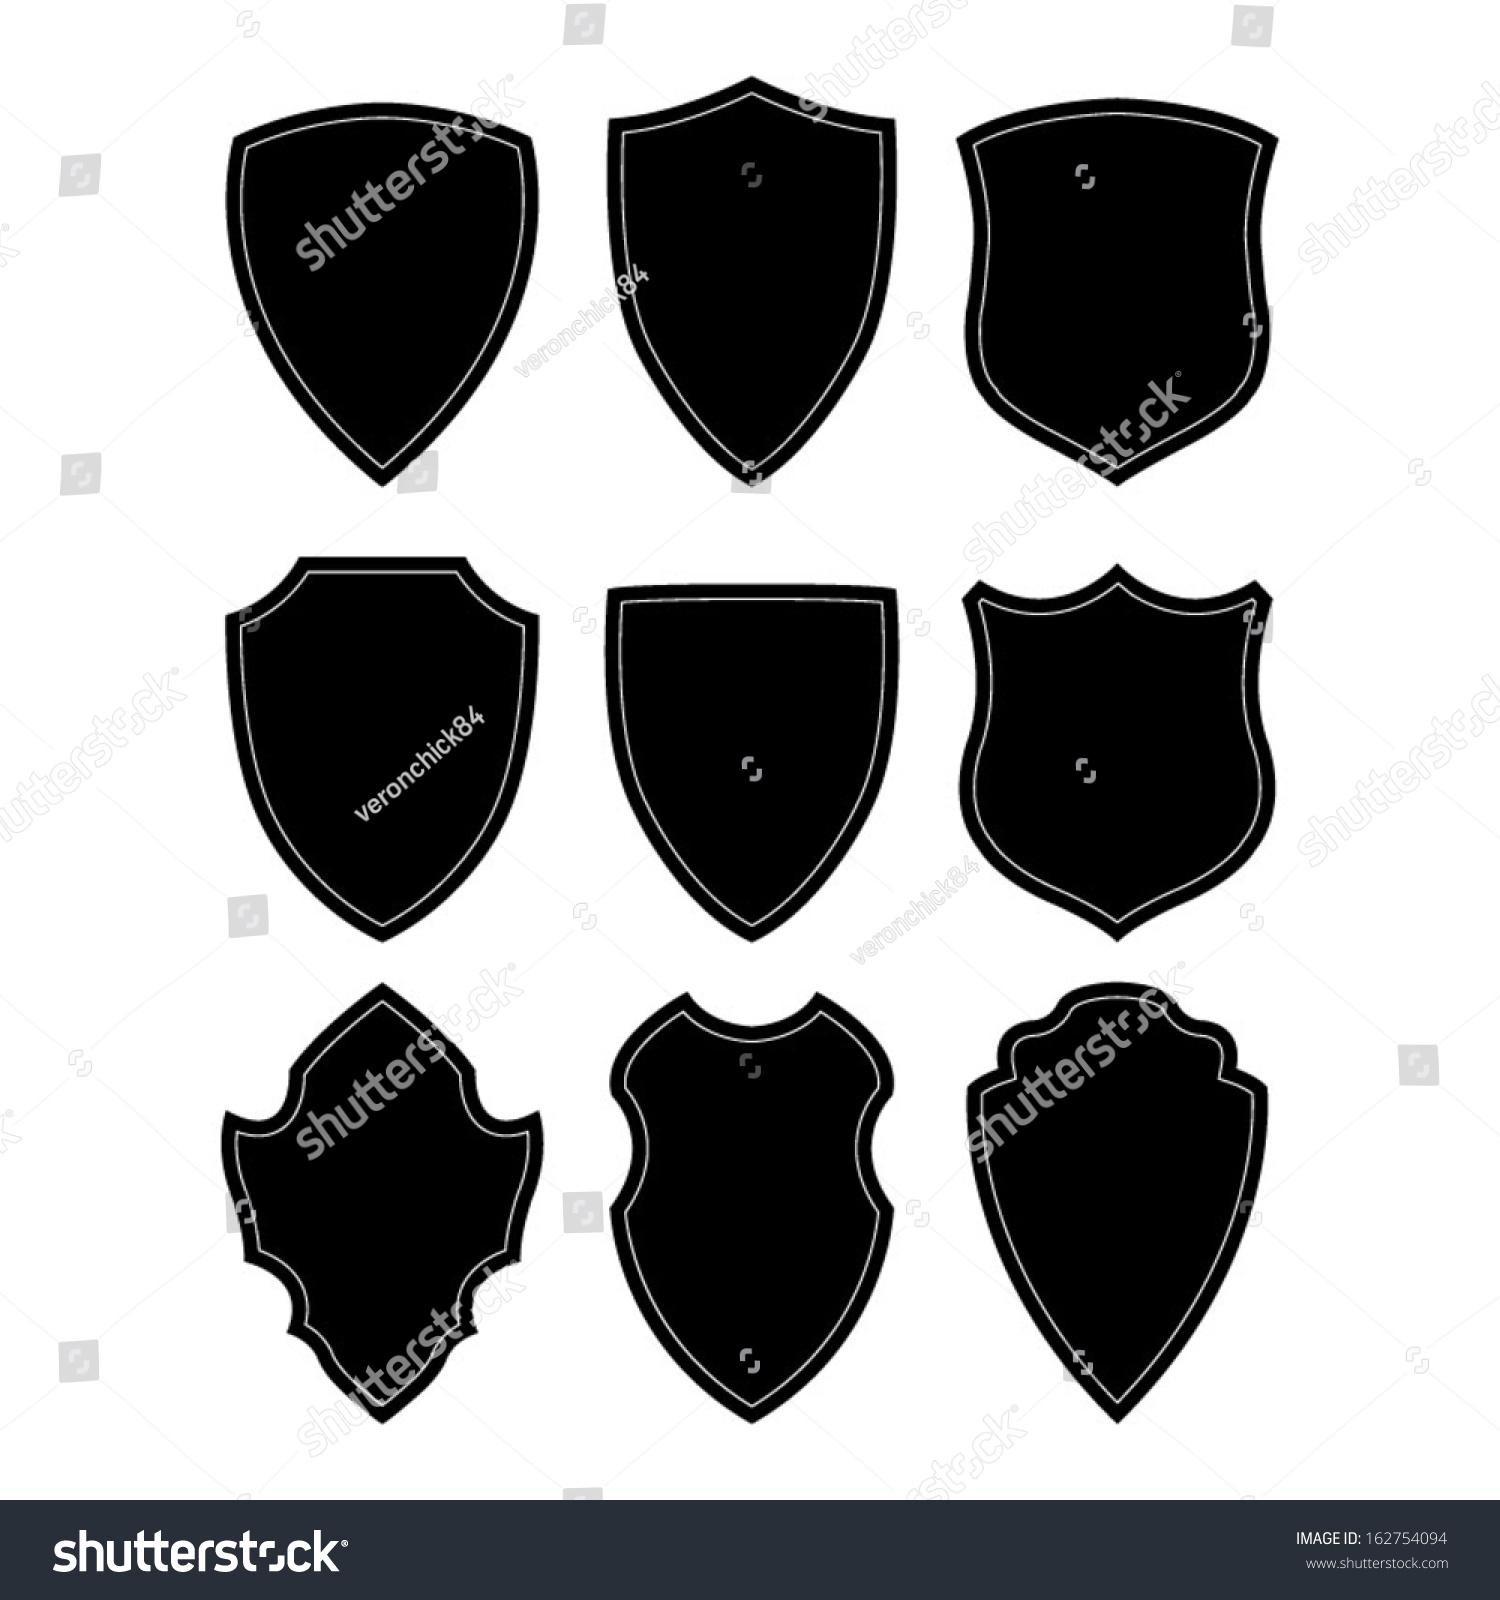 ppt 图标素材 安全 盾